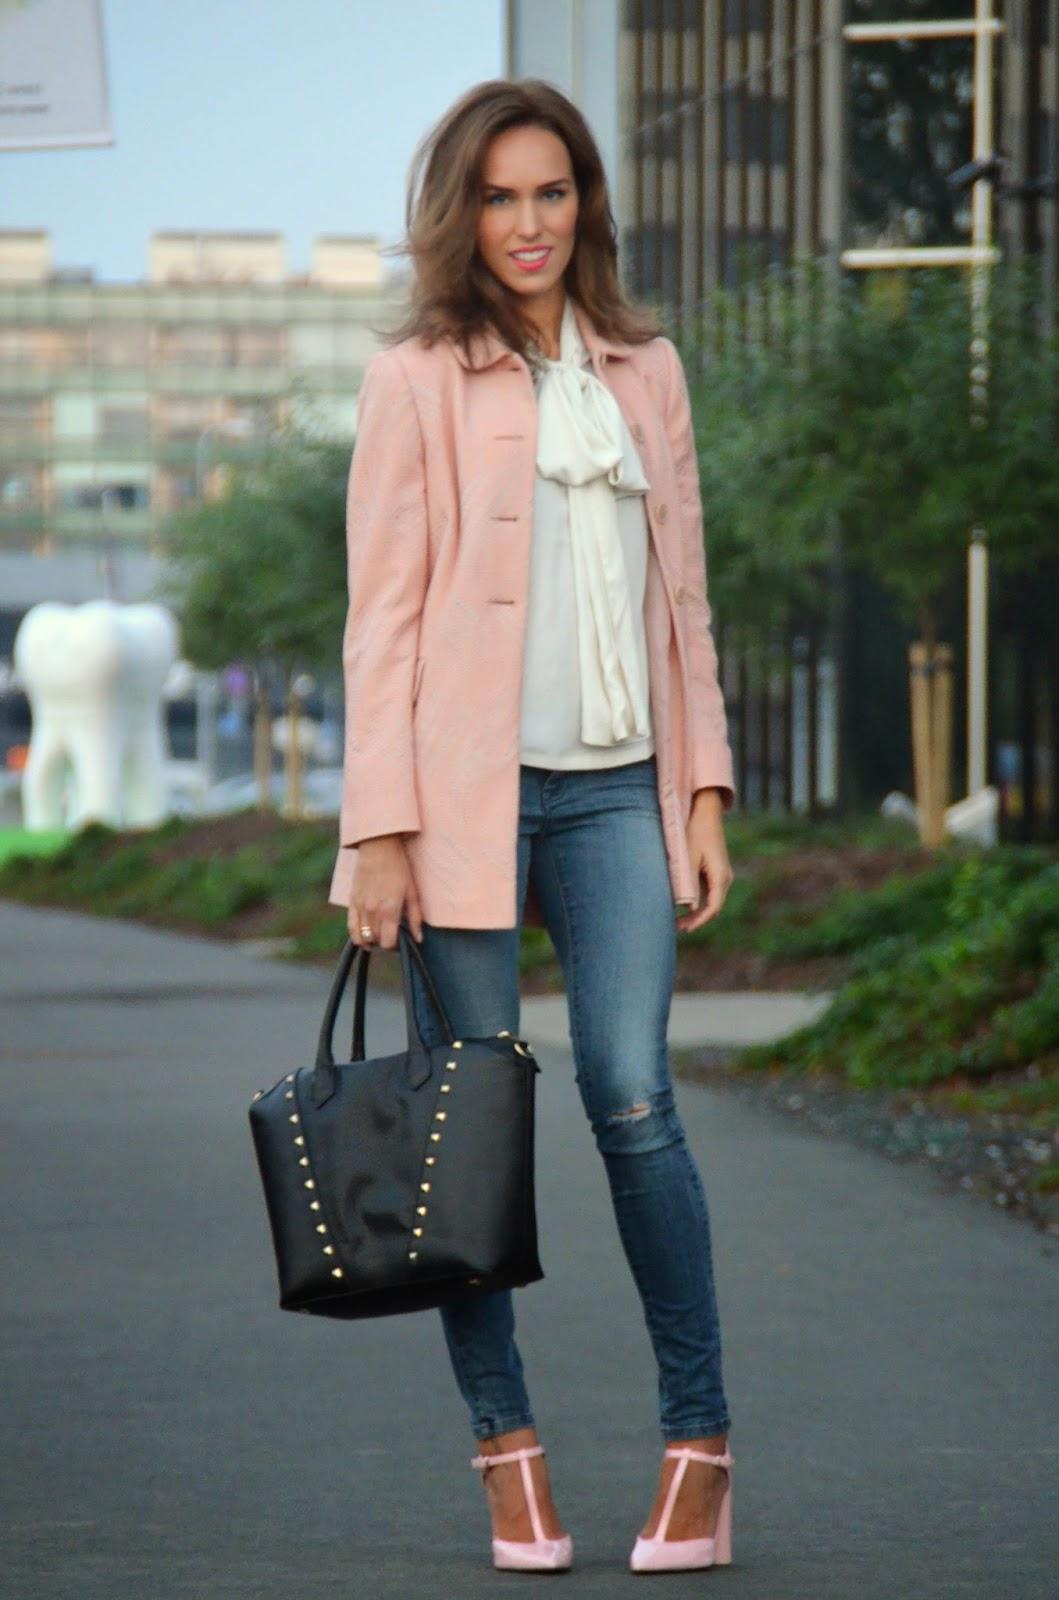 asos-bow-blouse-zara-jeans-primark-coat-hm-bag